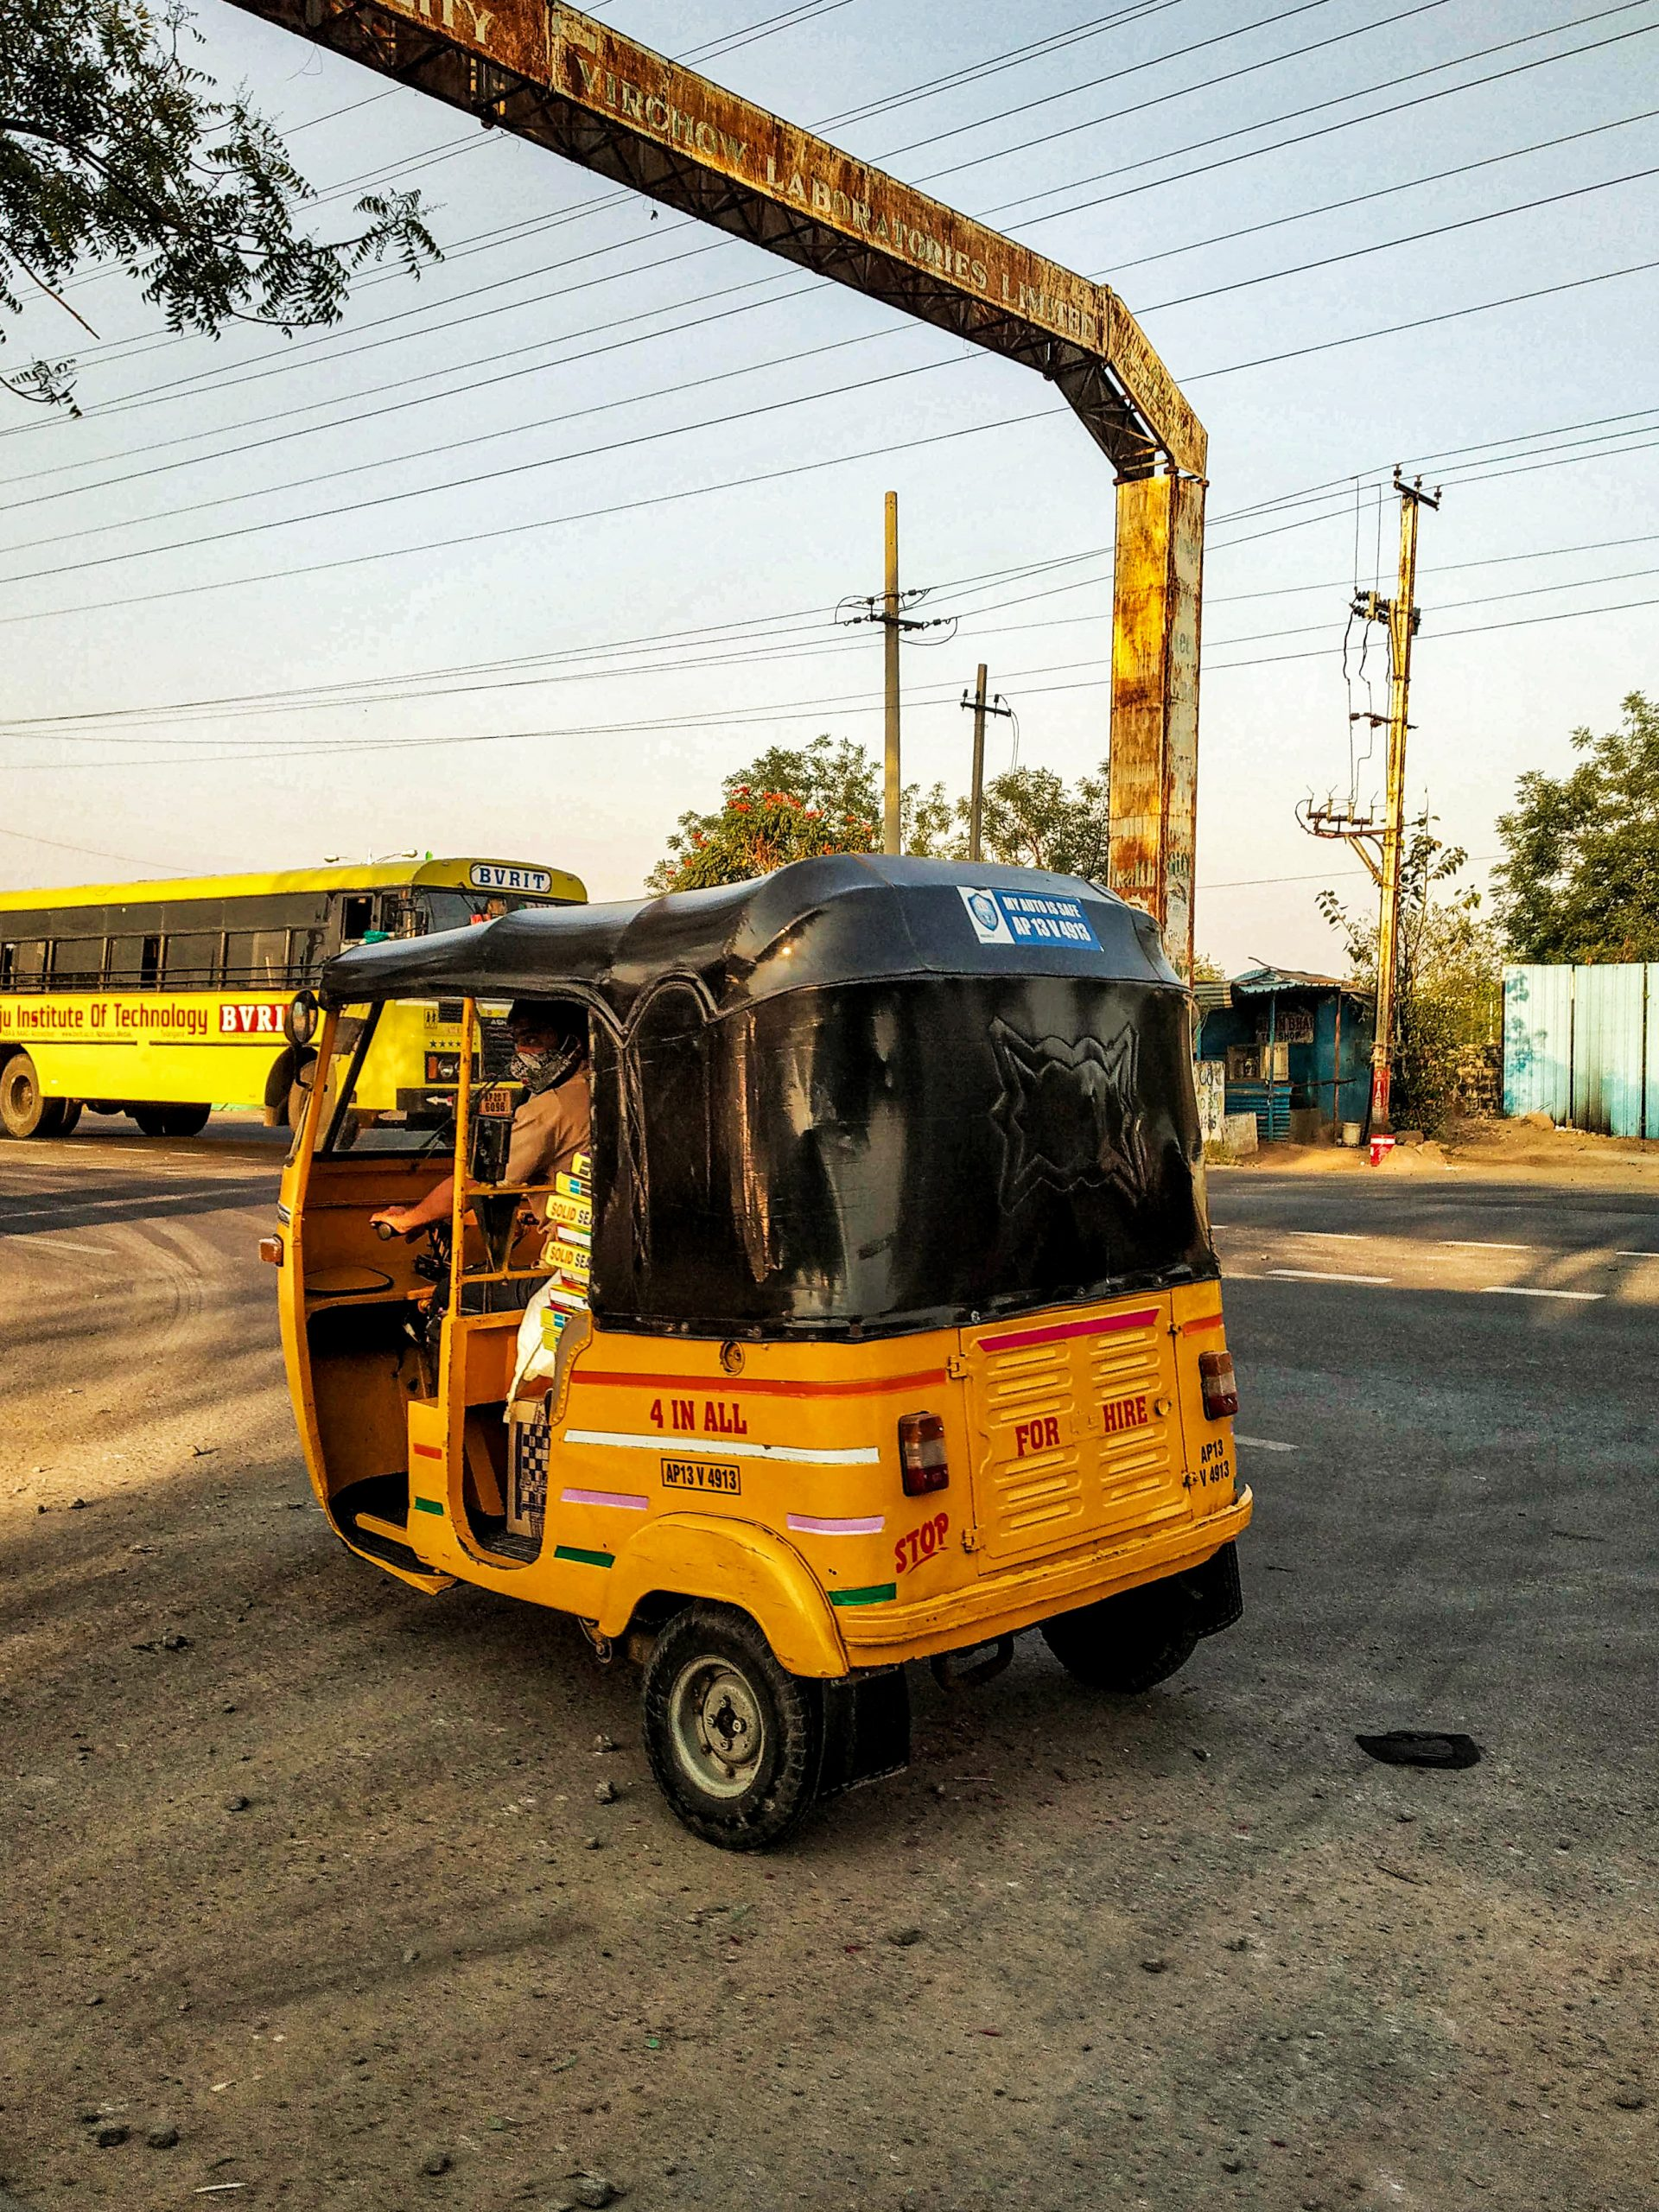 Autorickshaw on the road